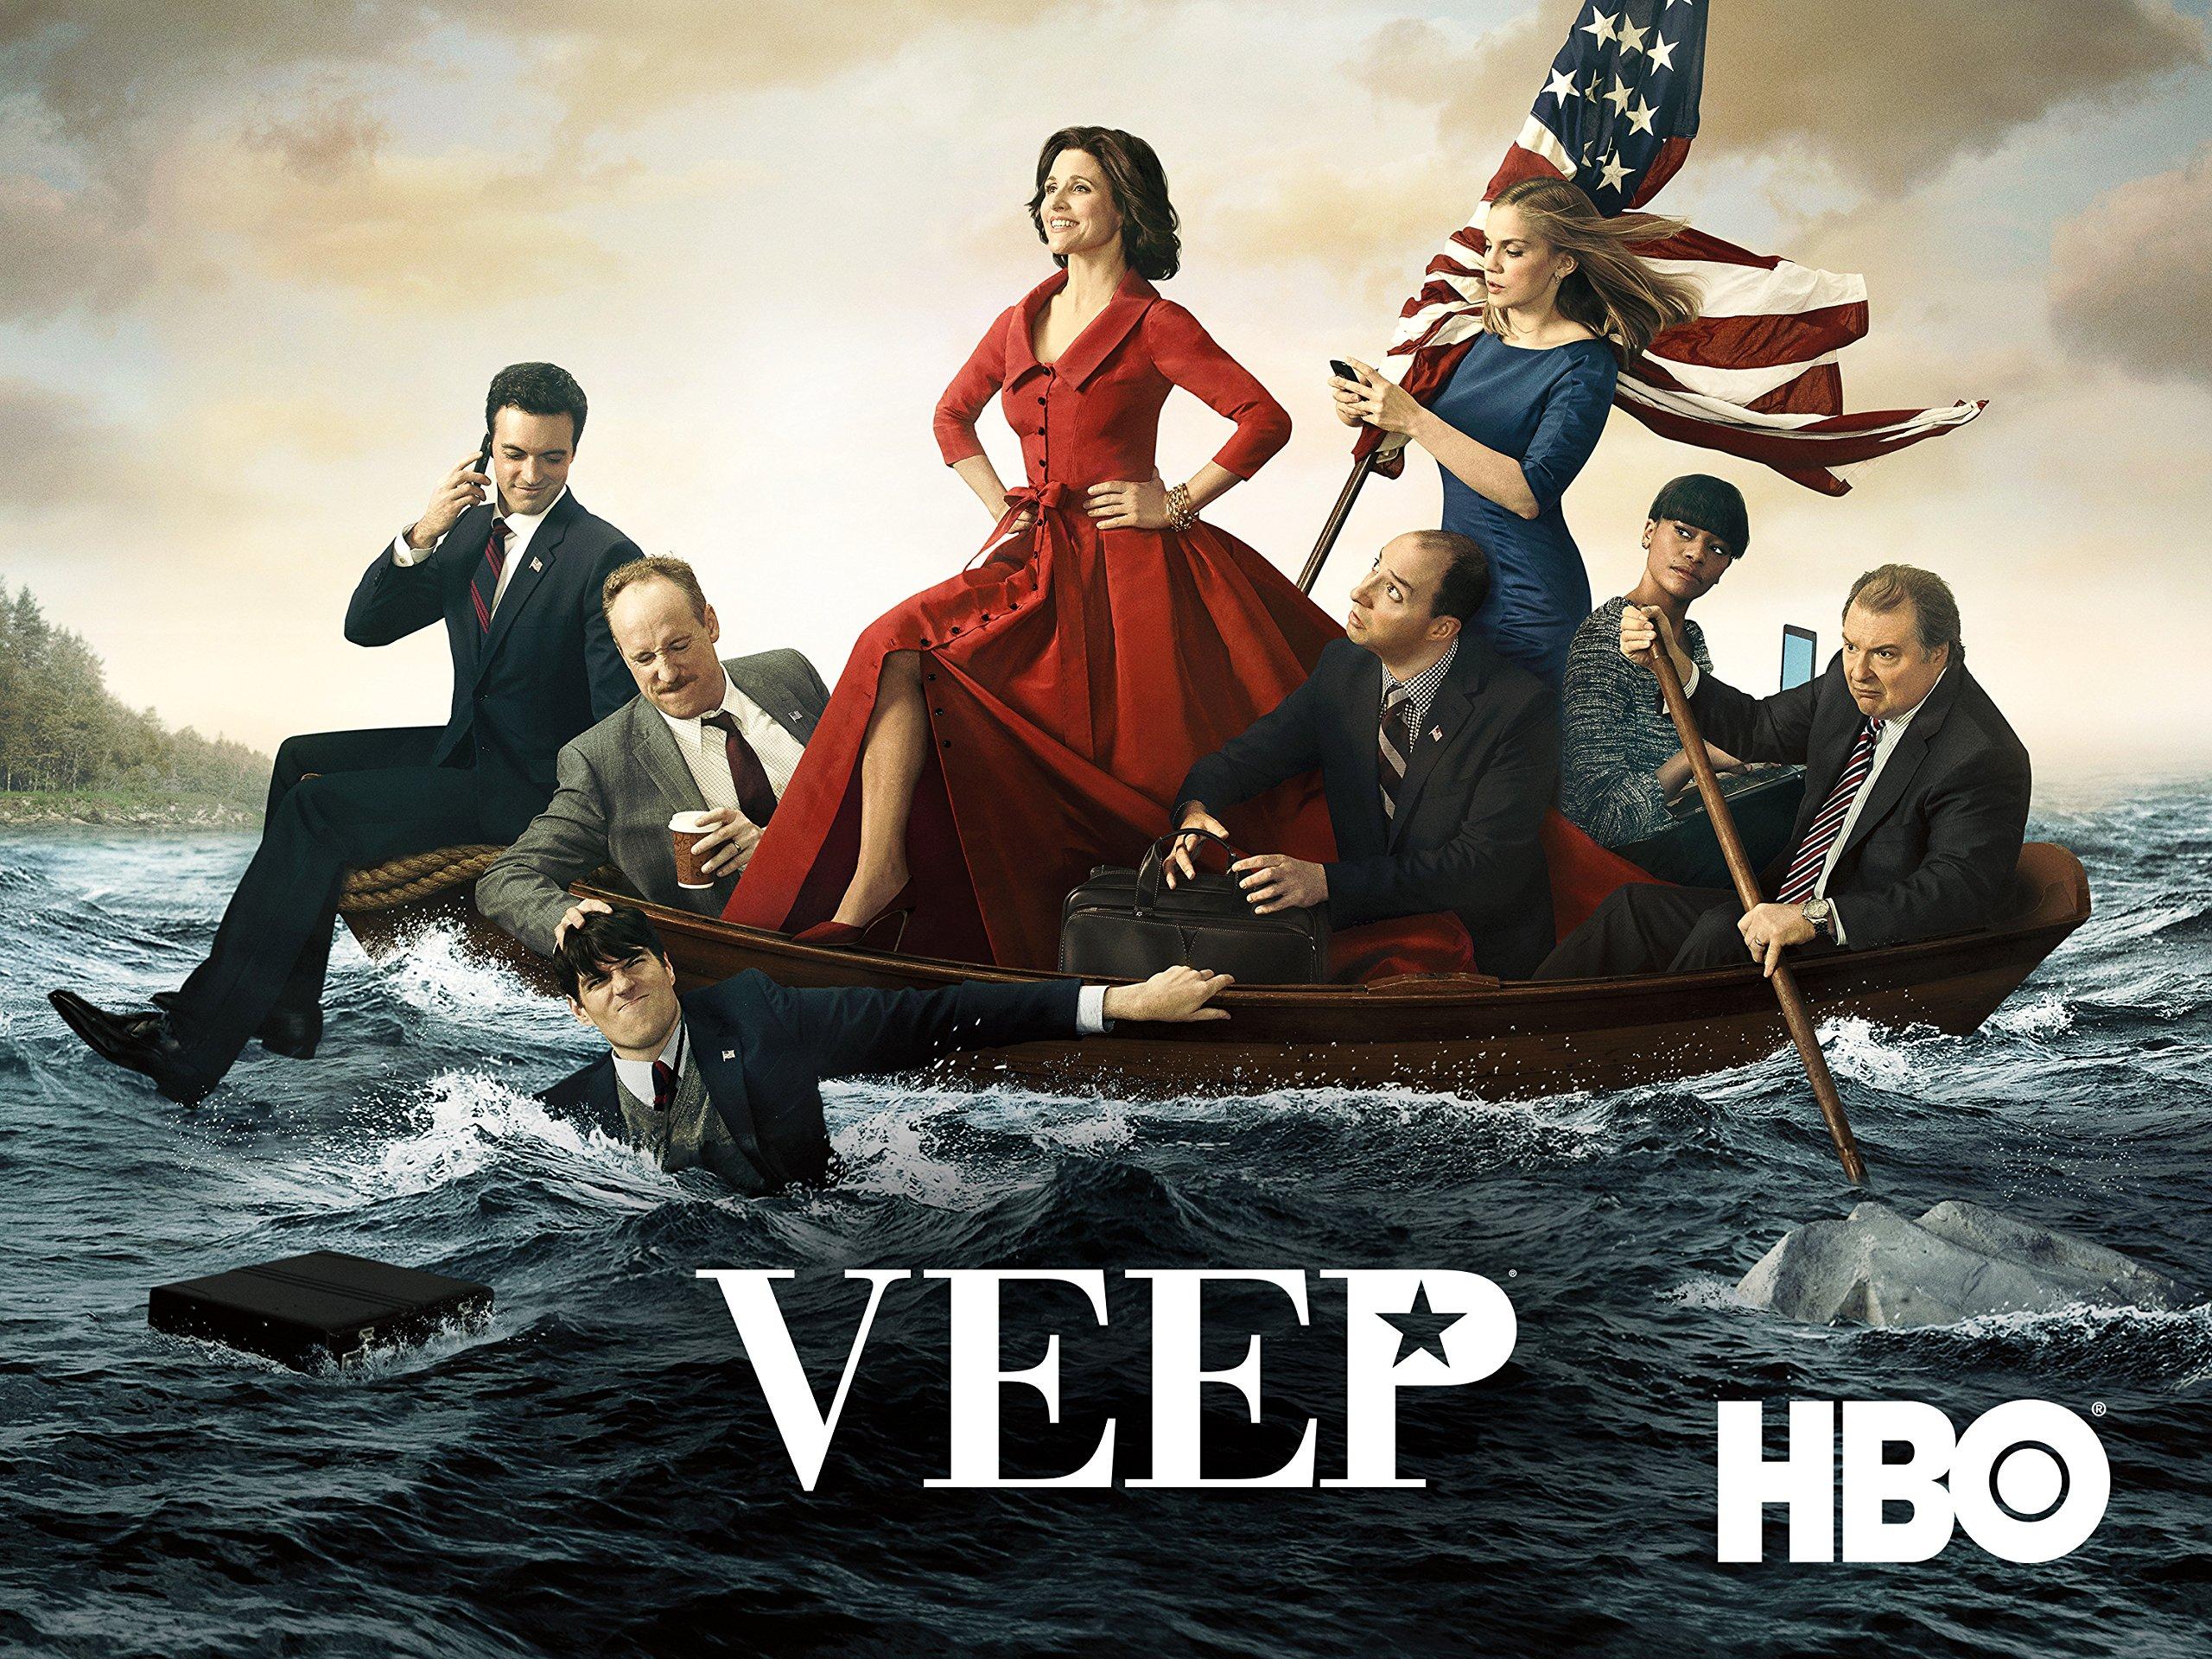 Veep season 1 torrent complete